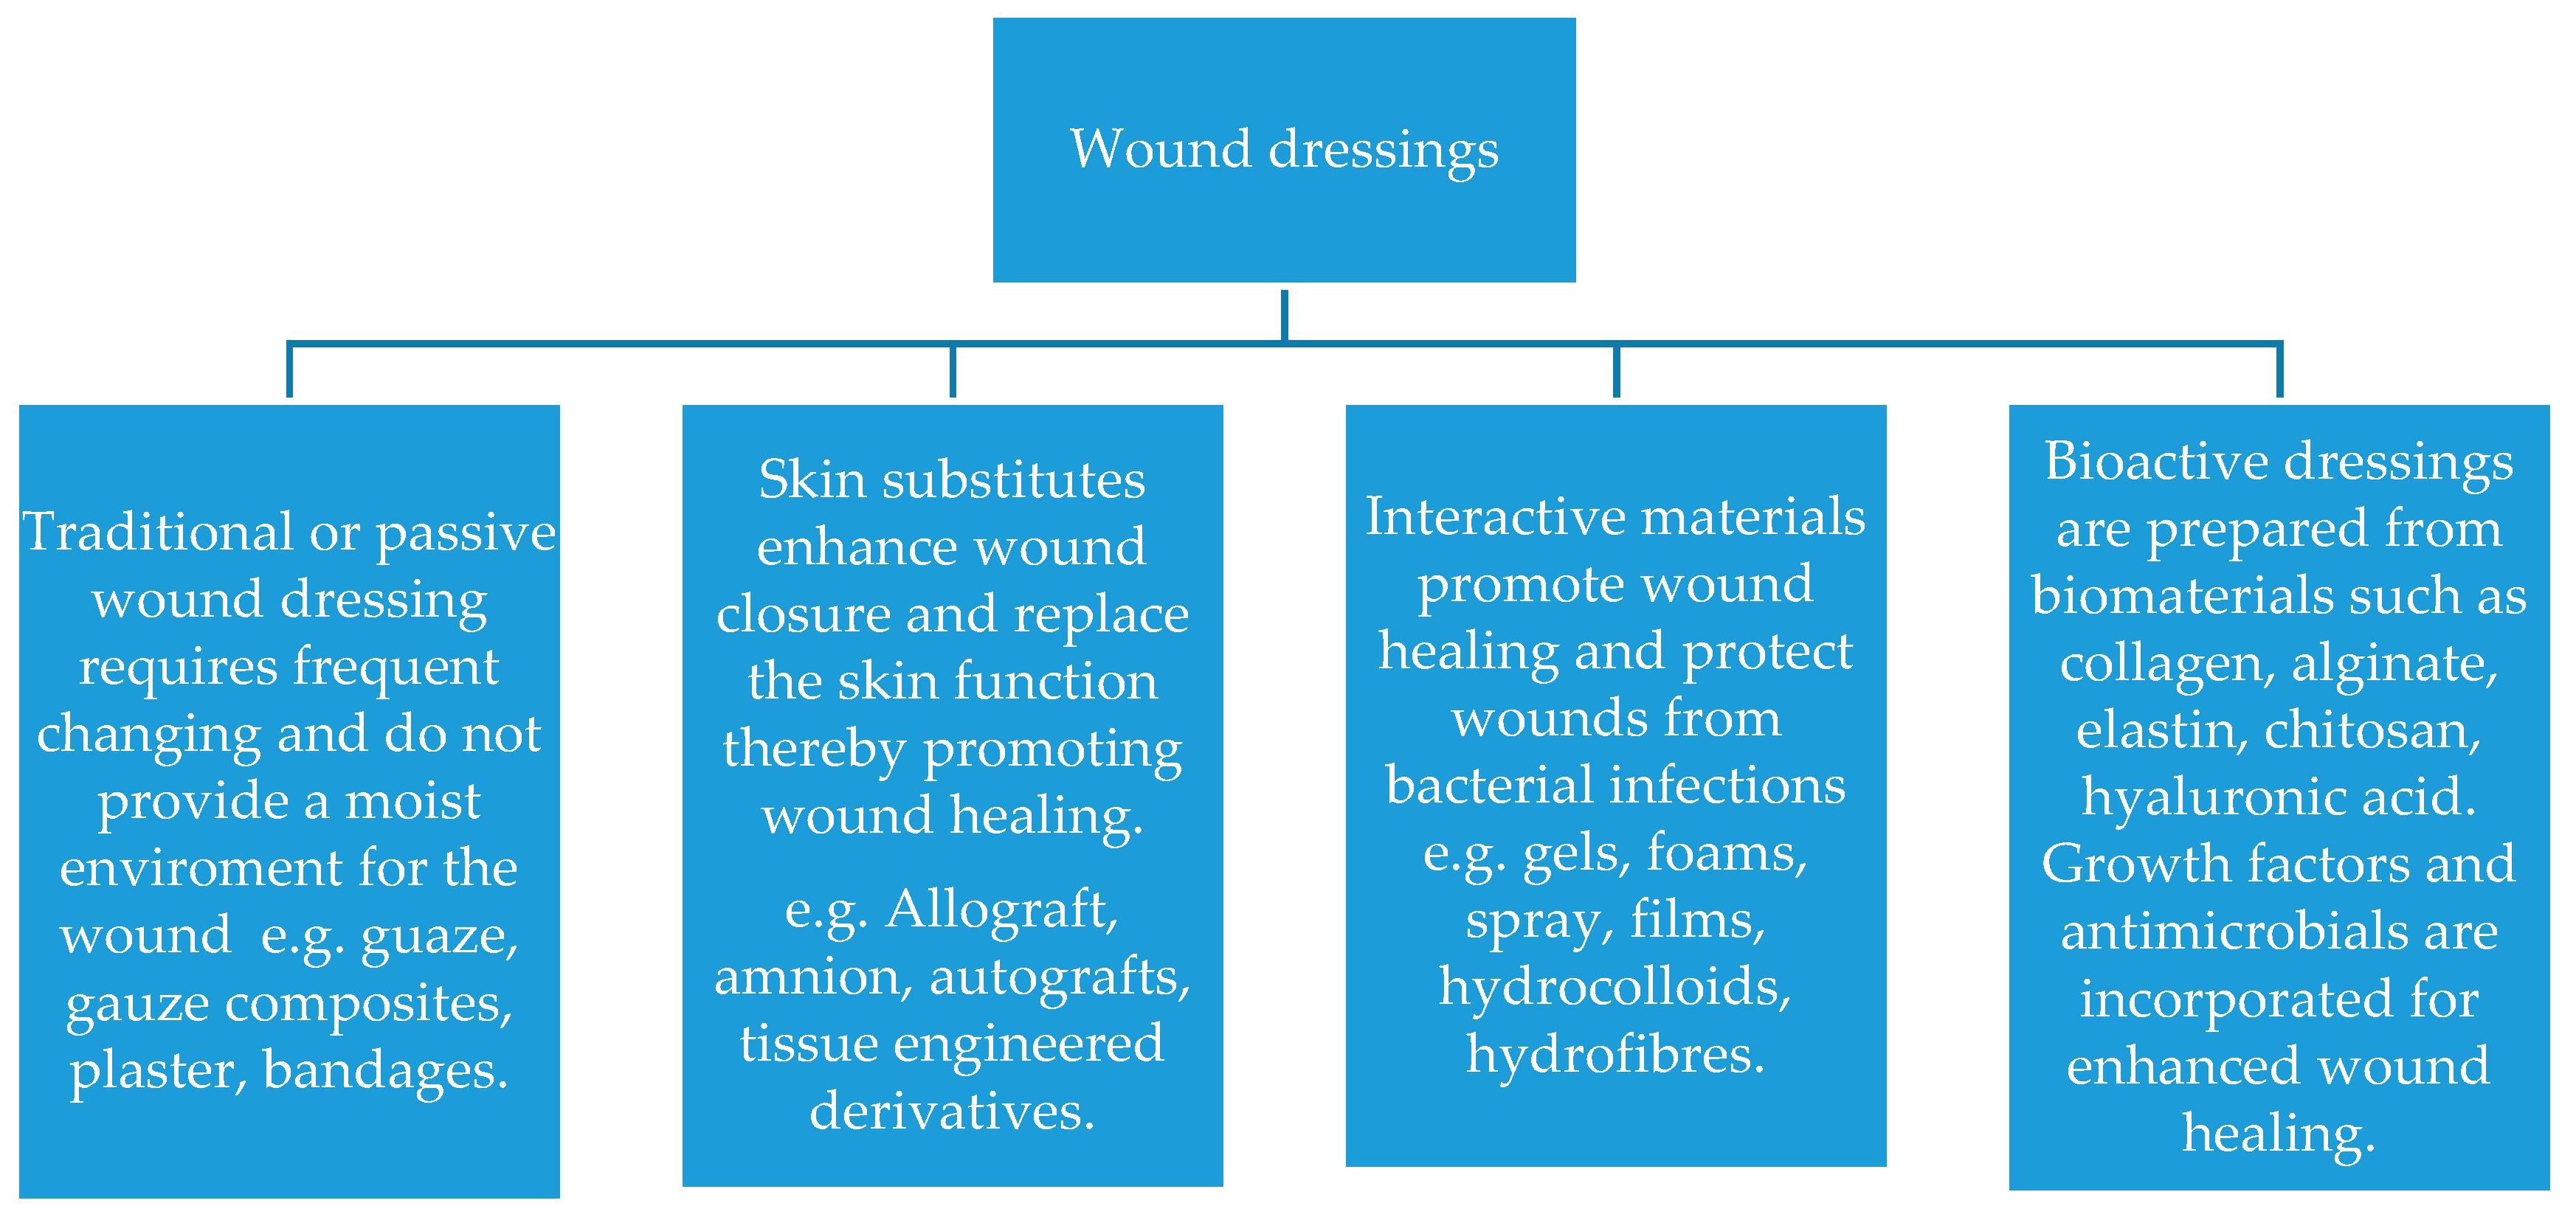 Pharmaceutics Free Full Text Alginate In Wound Dressings Html U Frezz Multipurpose Antimicrobial Spray 10 00042 G002